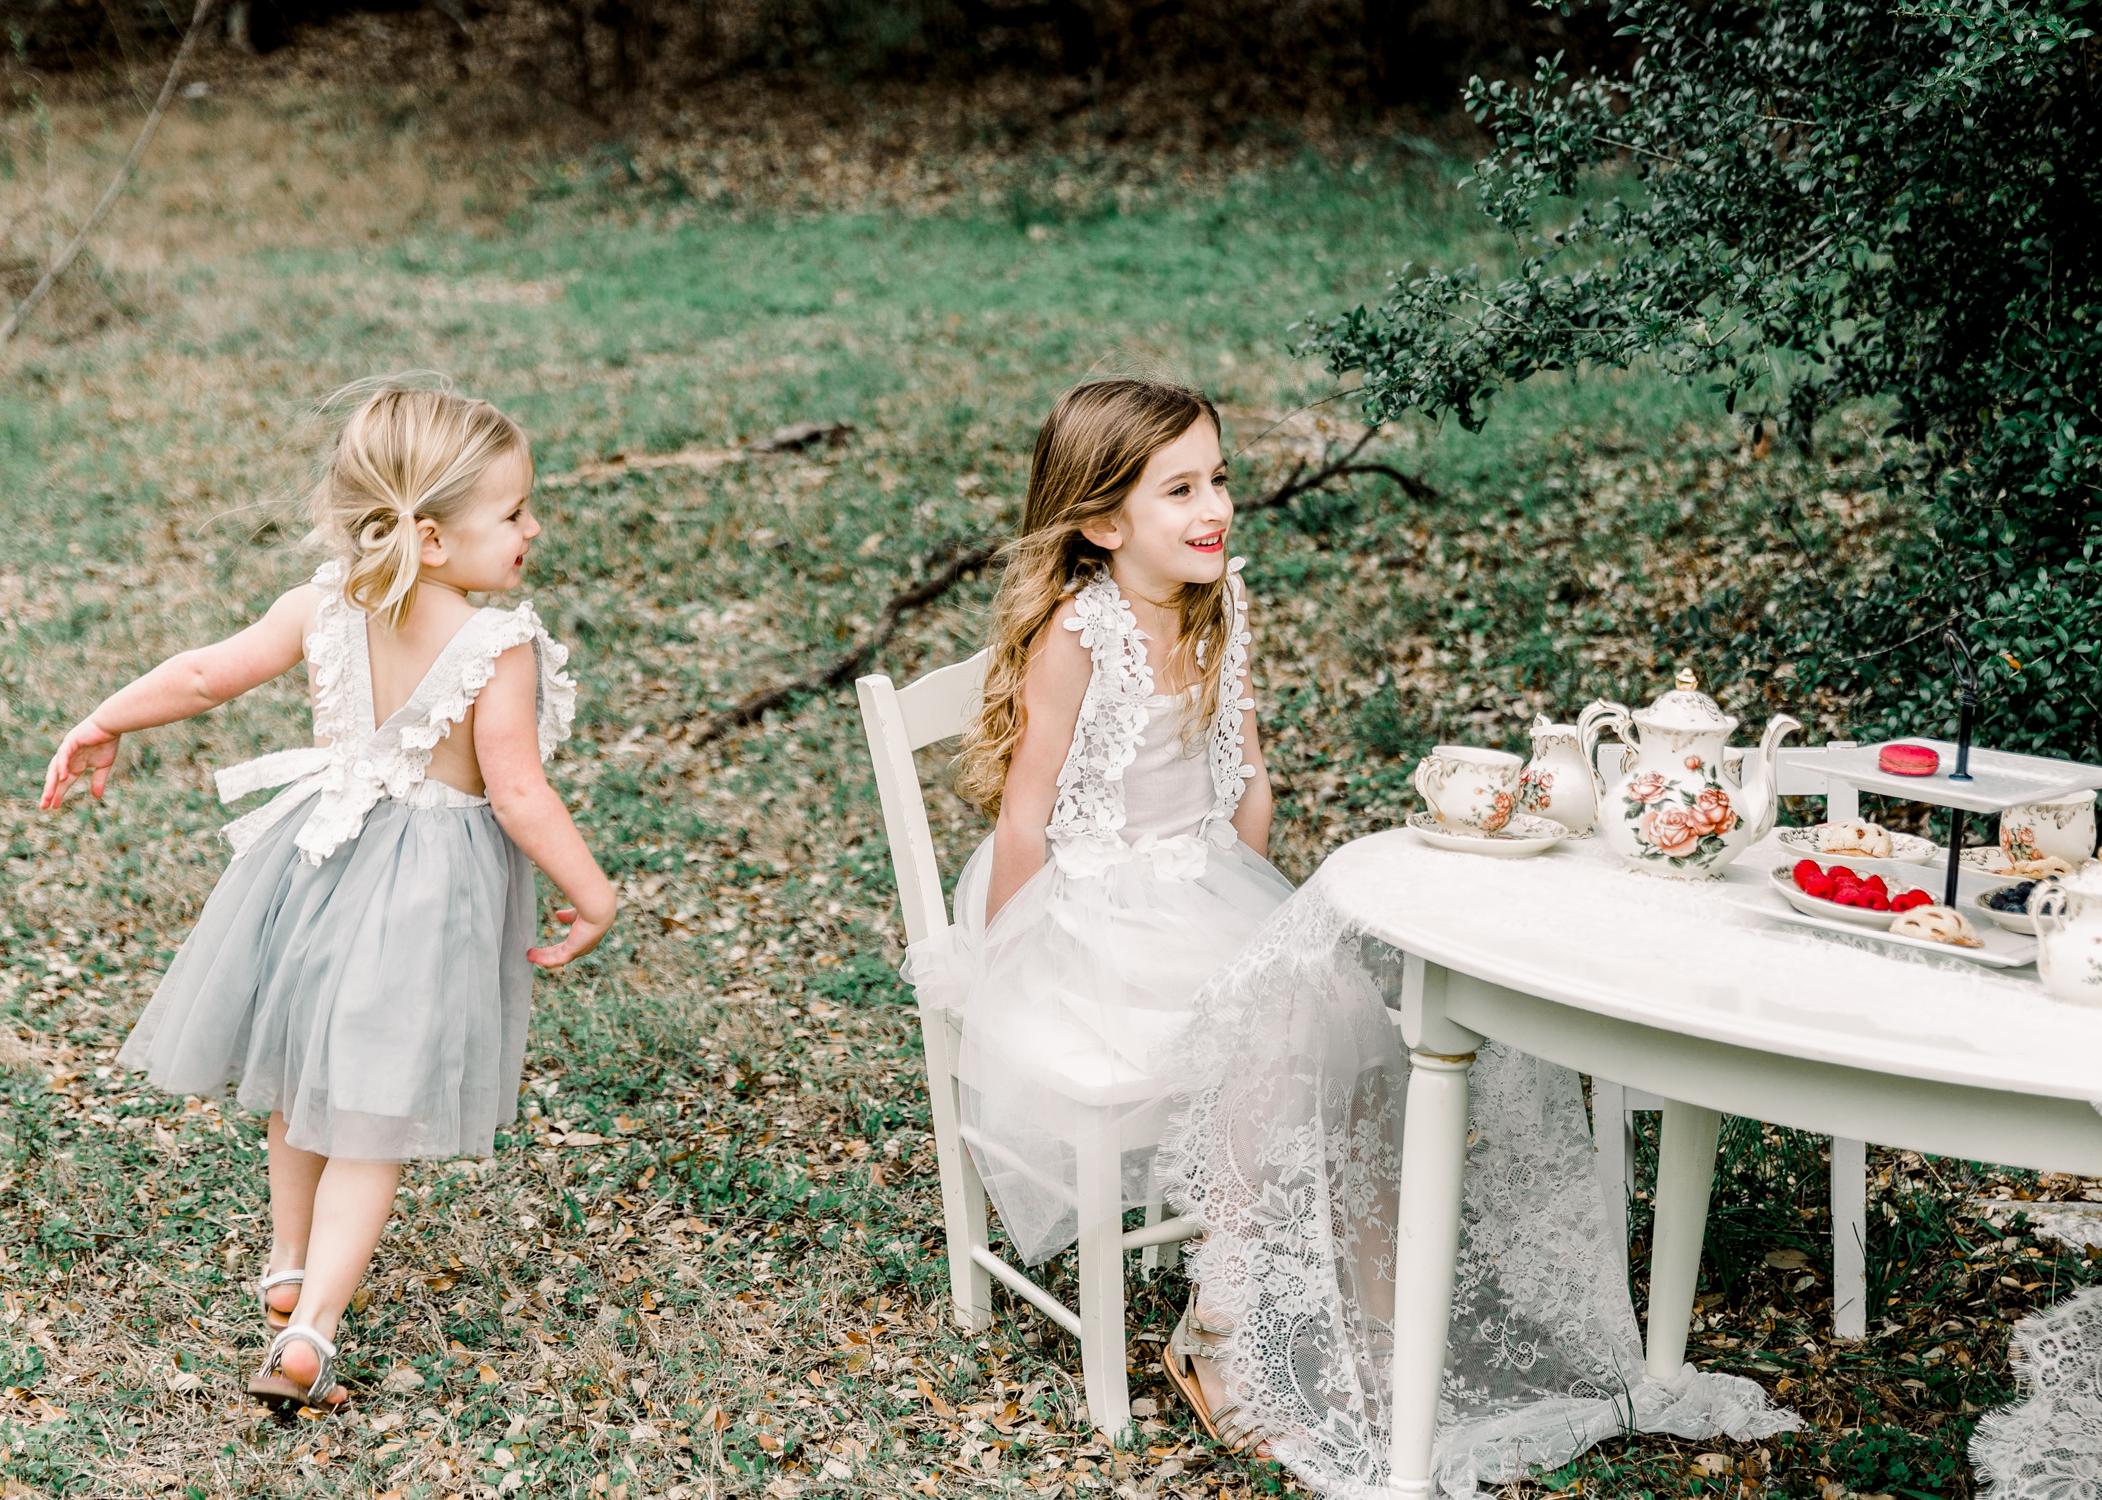 lifestyle-family-photographer-franklin-tea-time-20.jpg